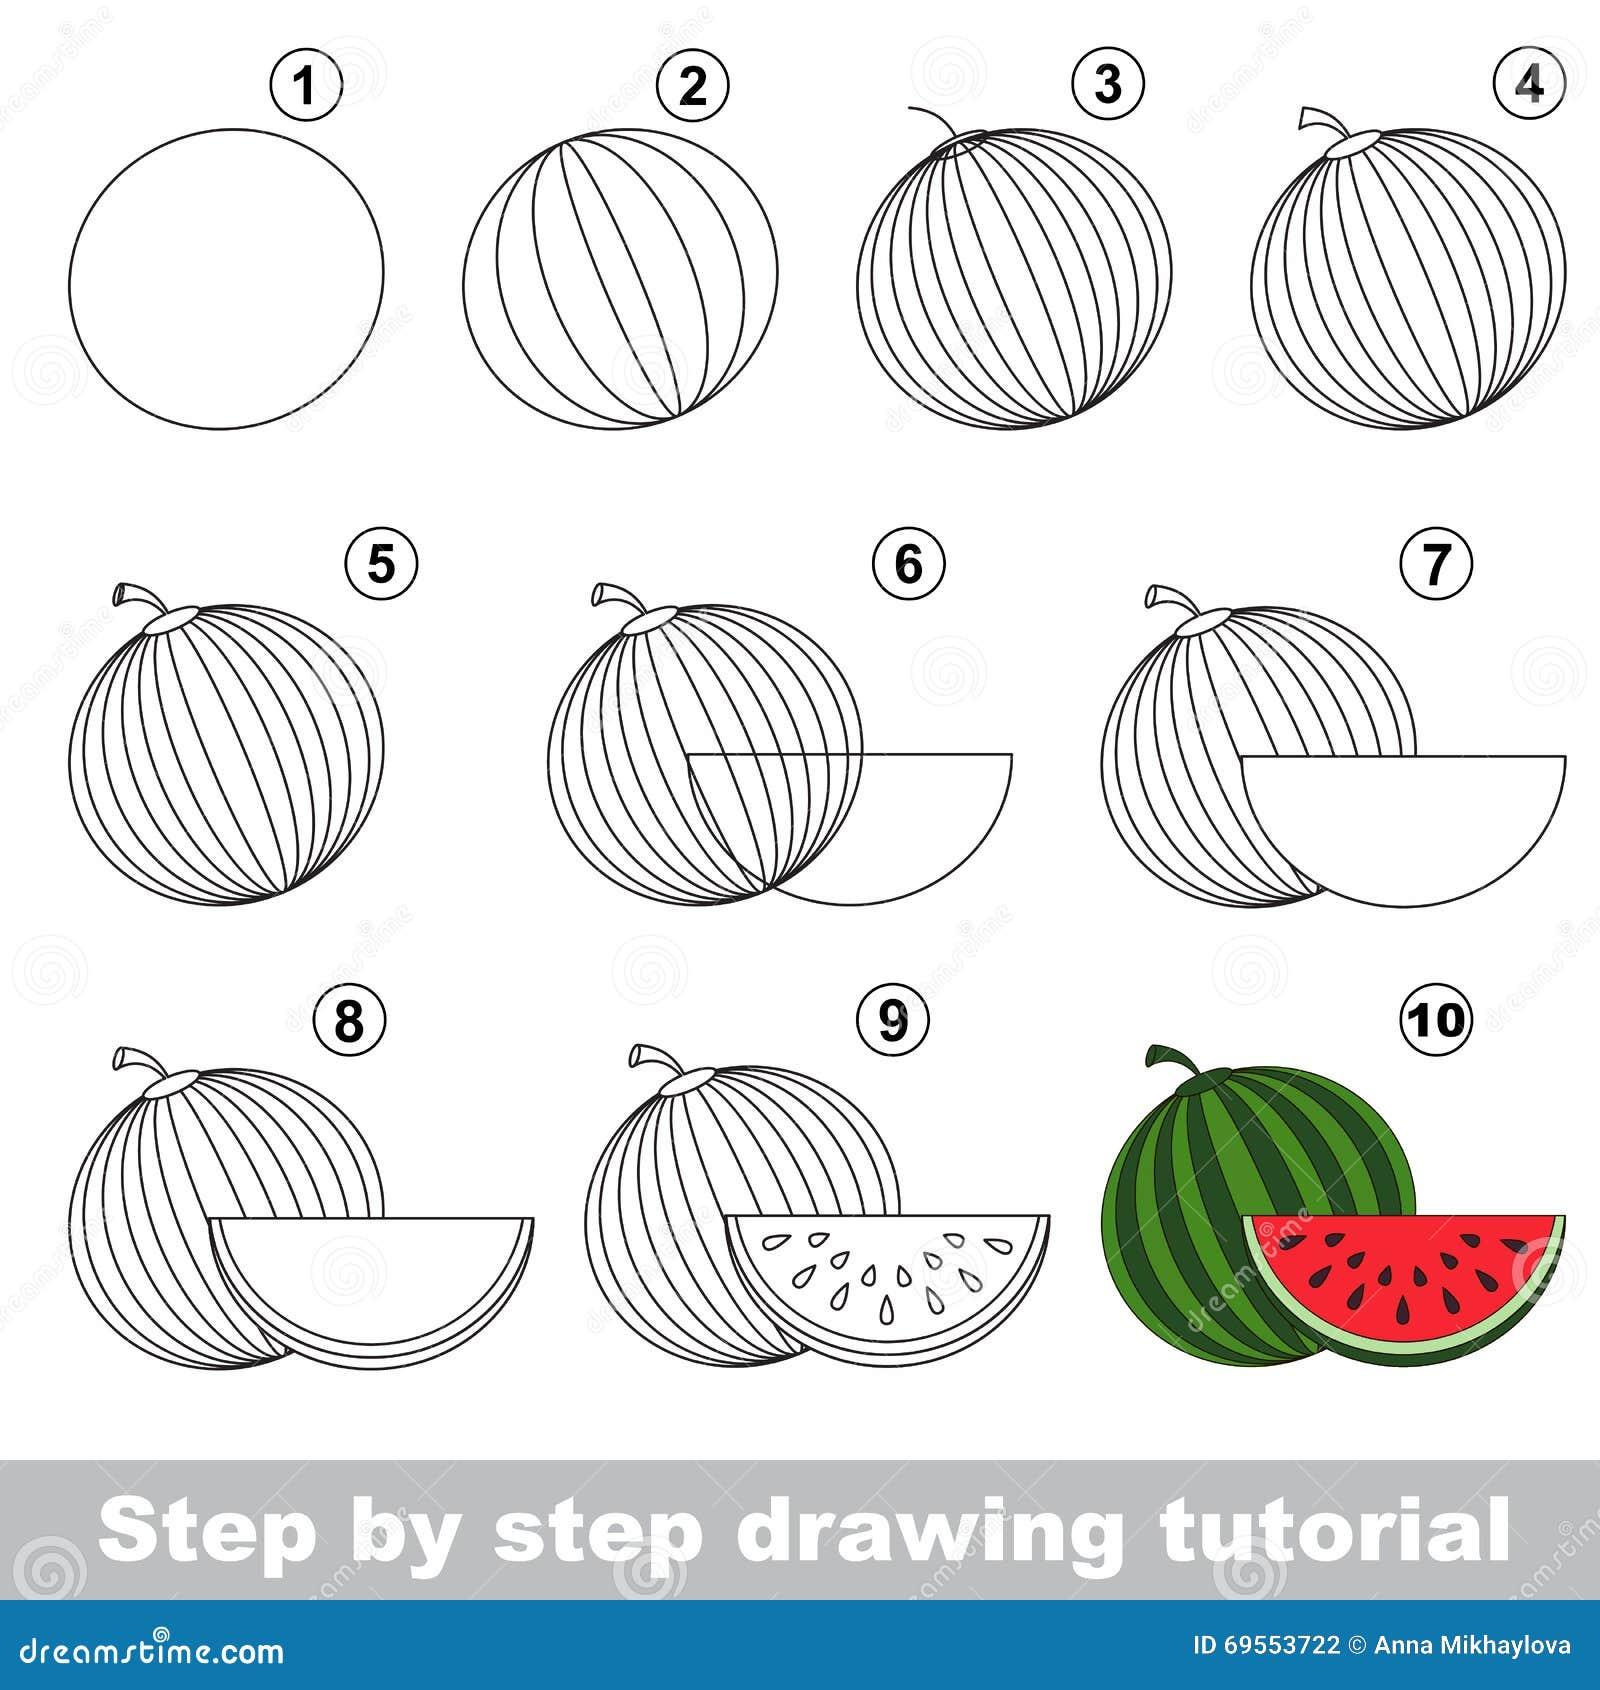 Watermelon drawing tutorial